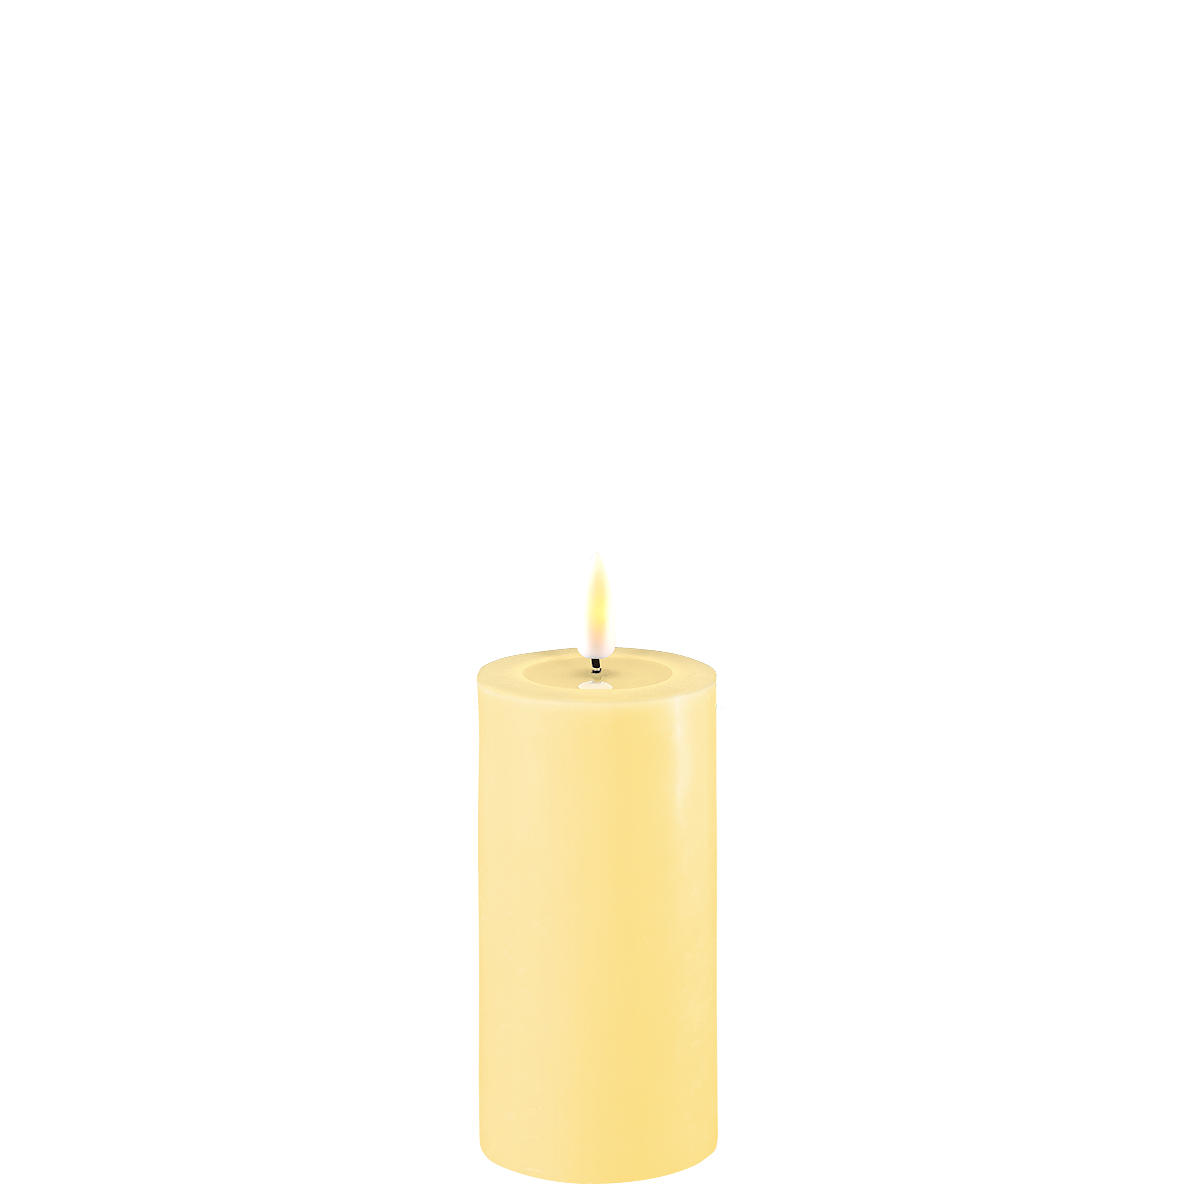 Deluxe Homeart LED Stumpenkerze Real Flame hellgelb